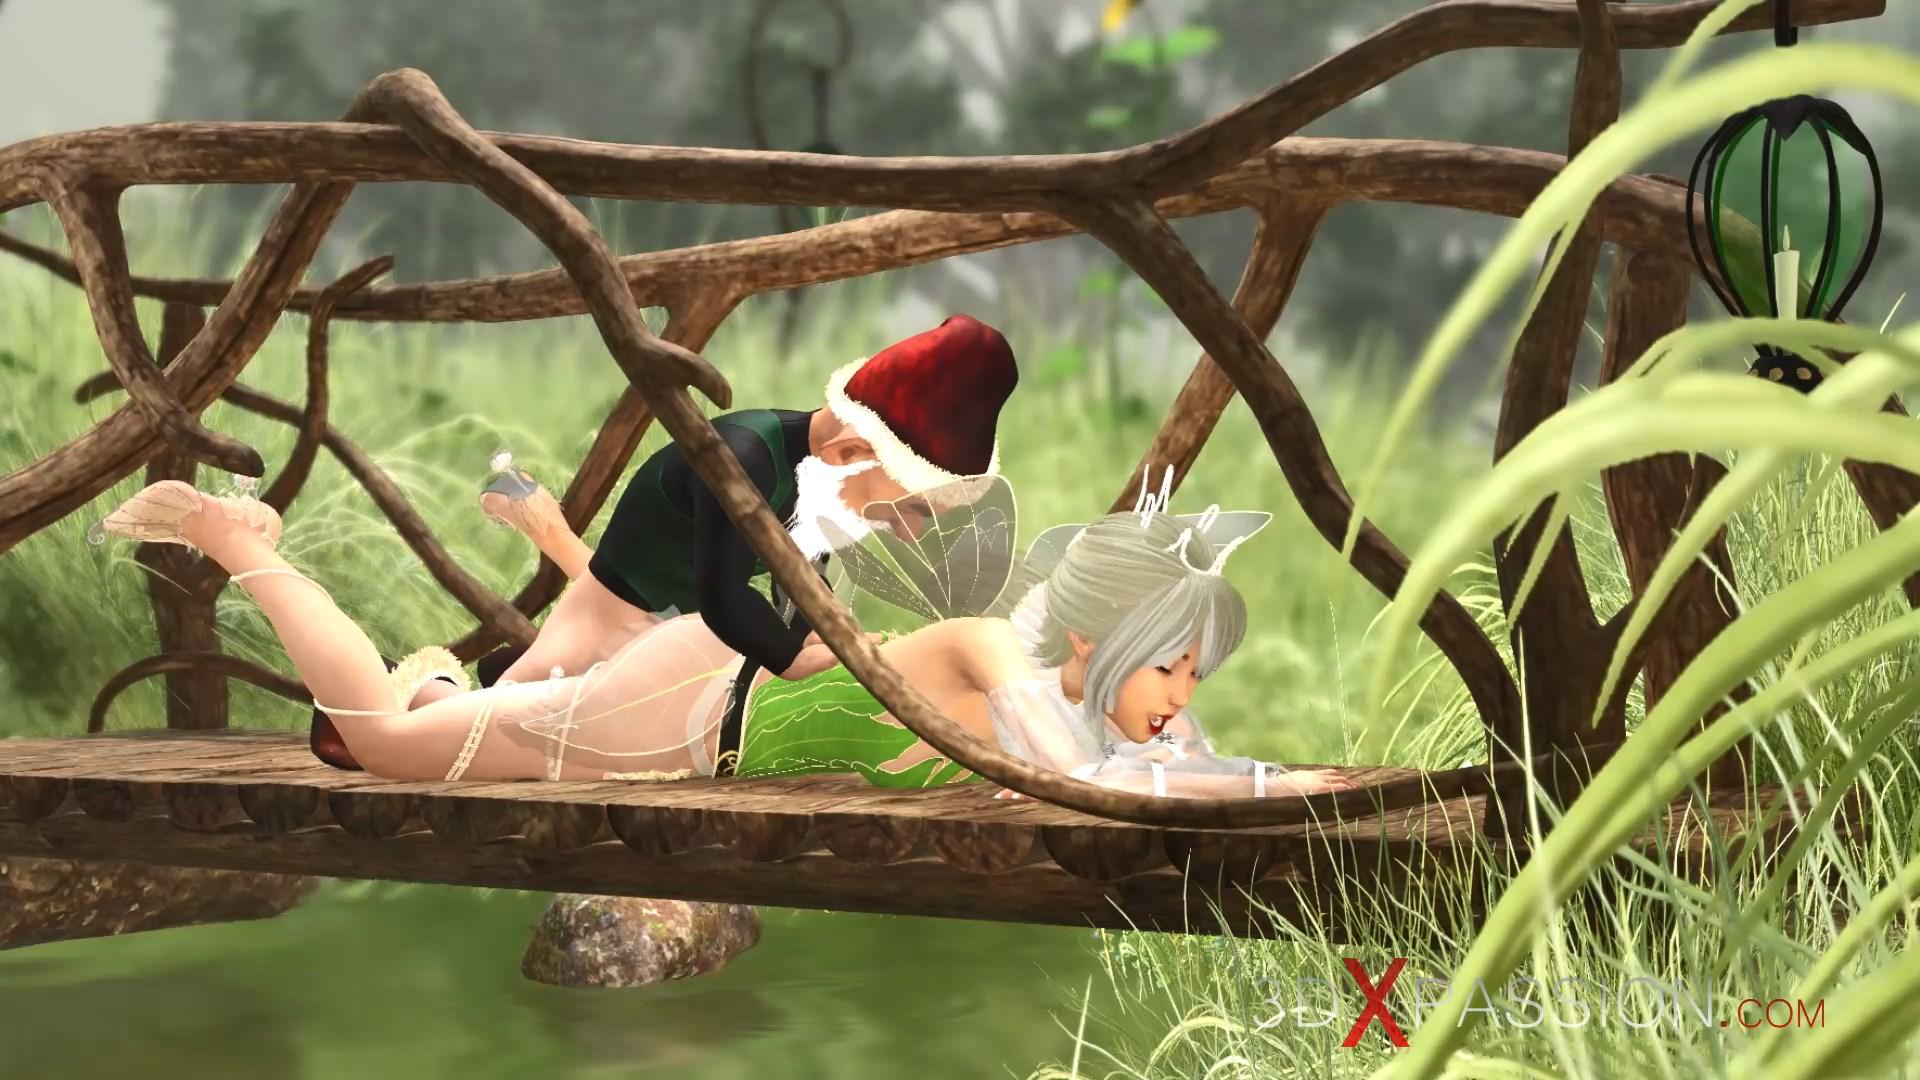 Horny beautiful teen fairy gnome village ass fuck